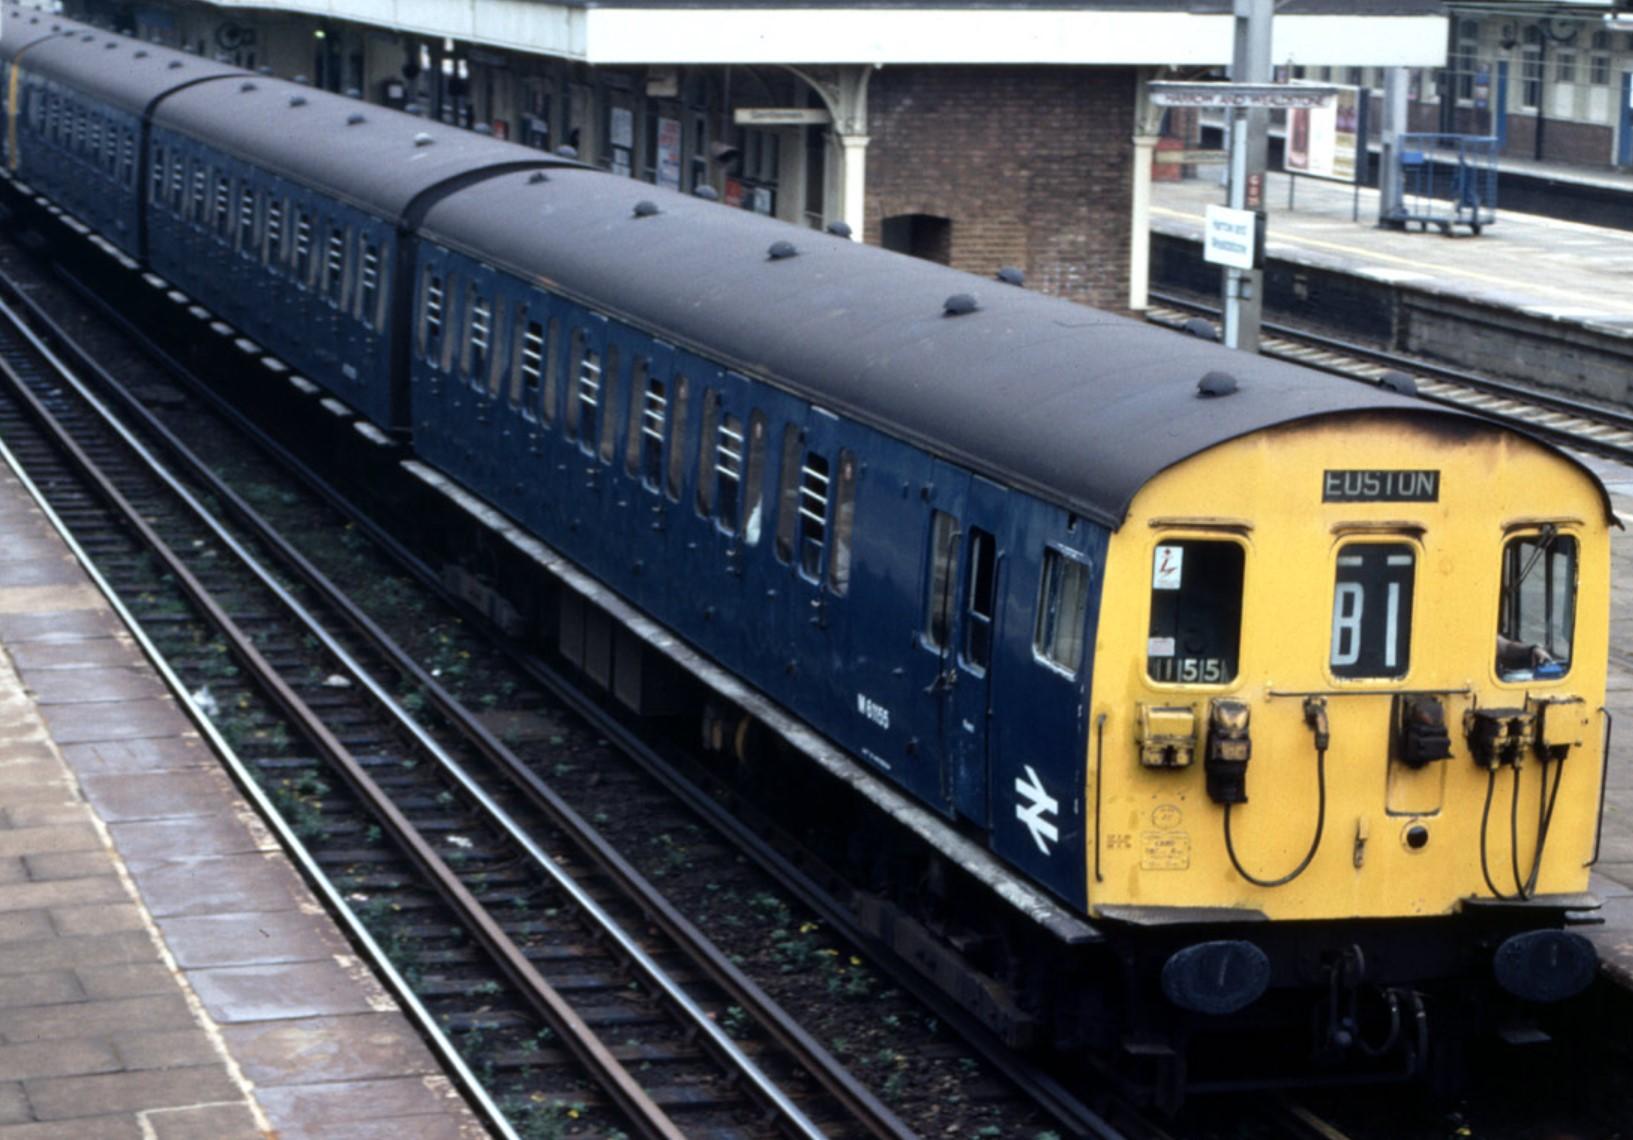 501 unit at Harrow & Wealdstone. Date unknown. ©Public Domain